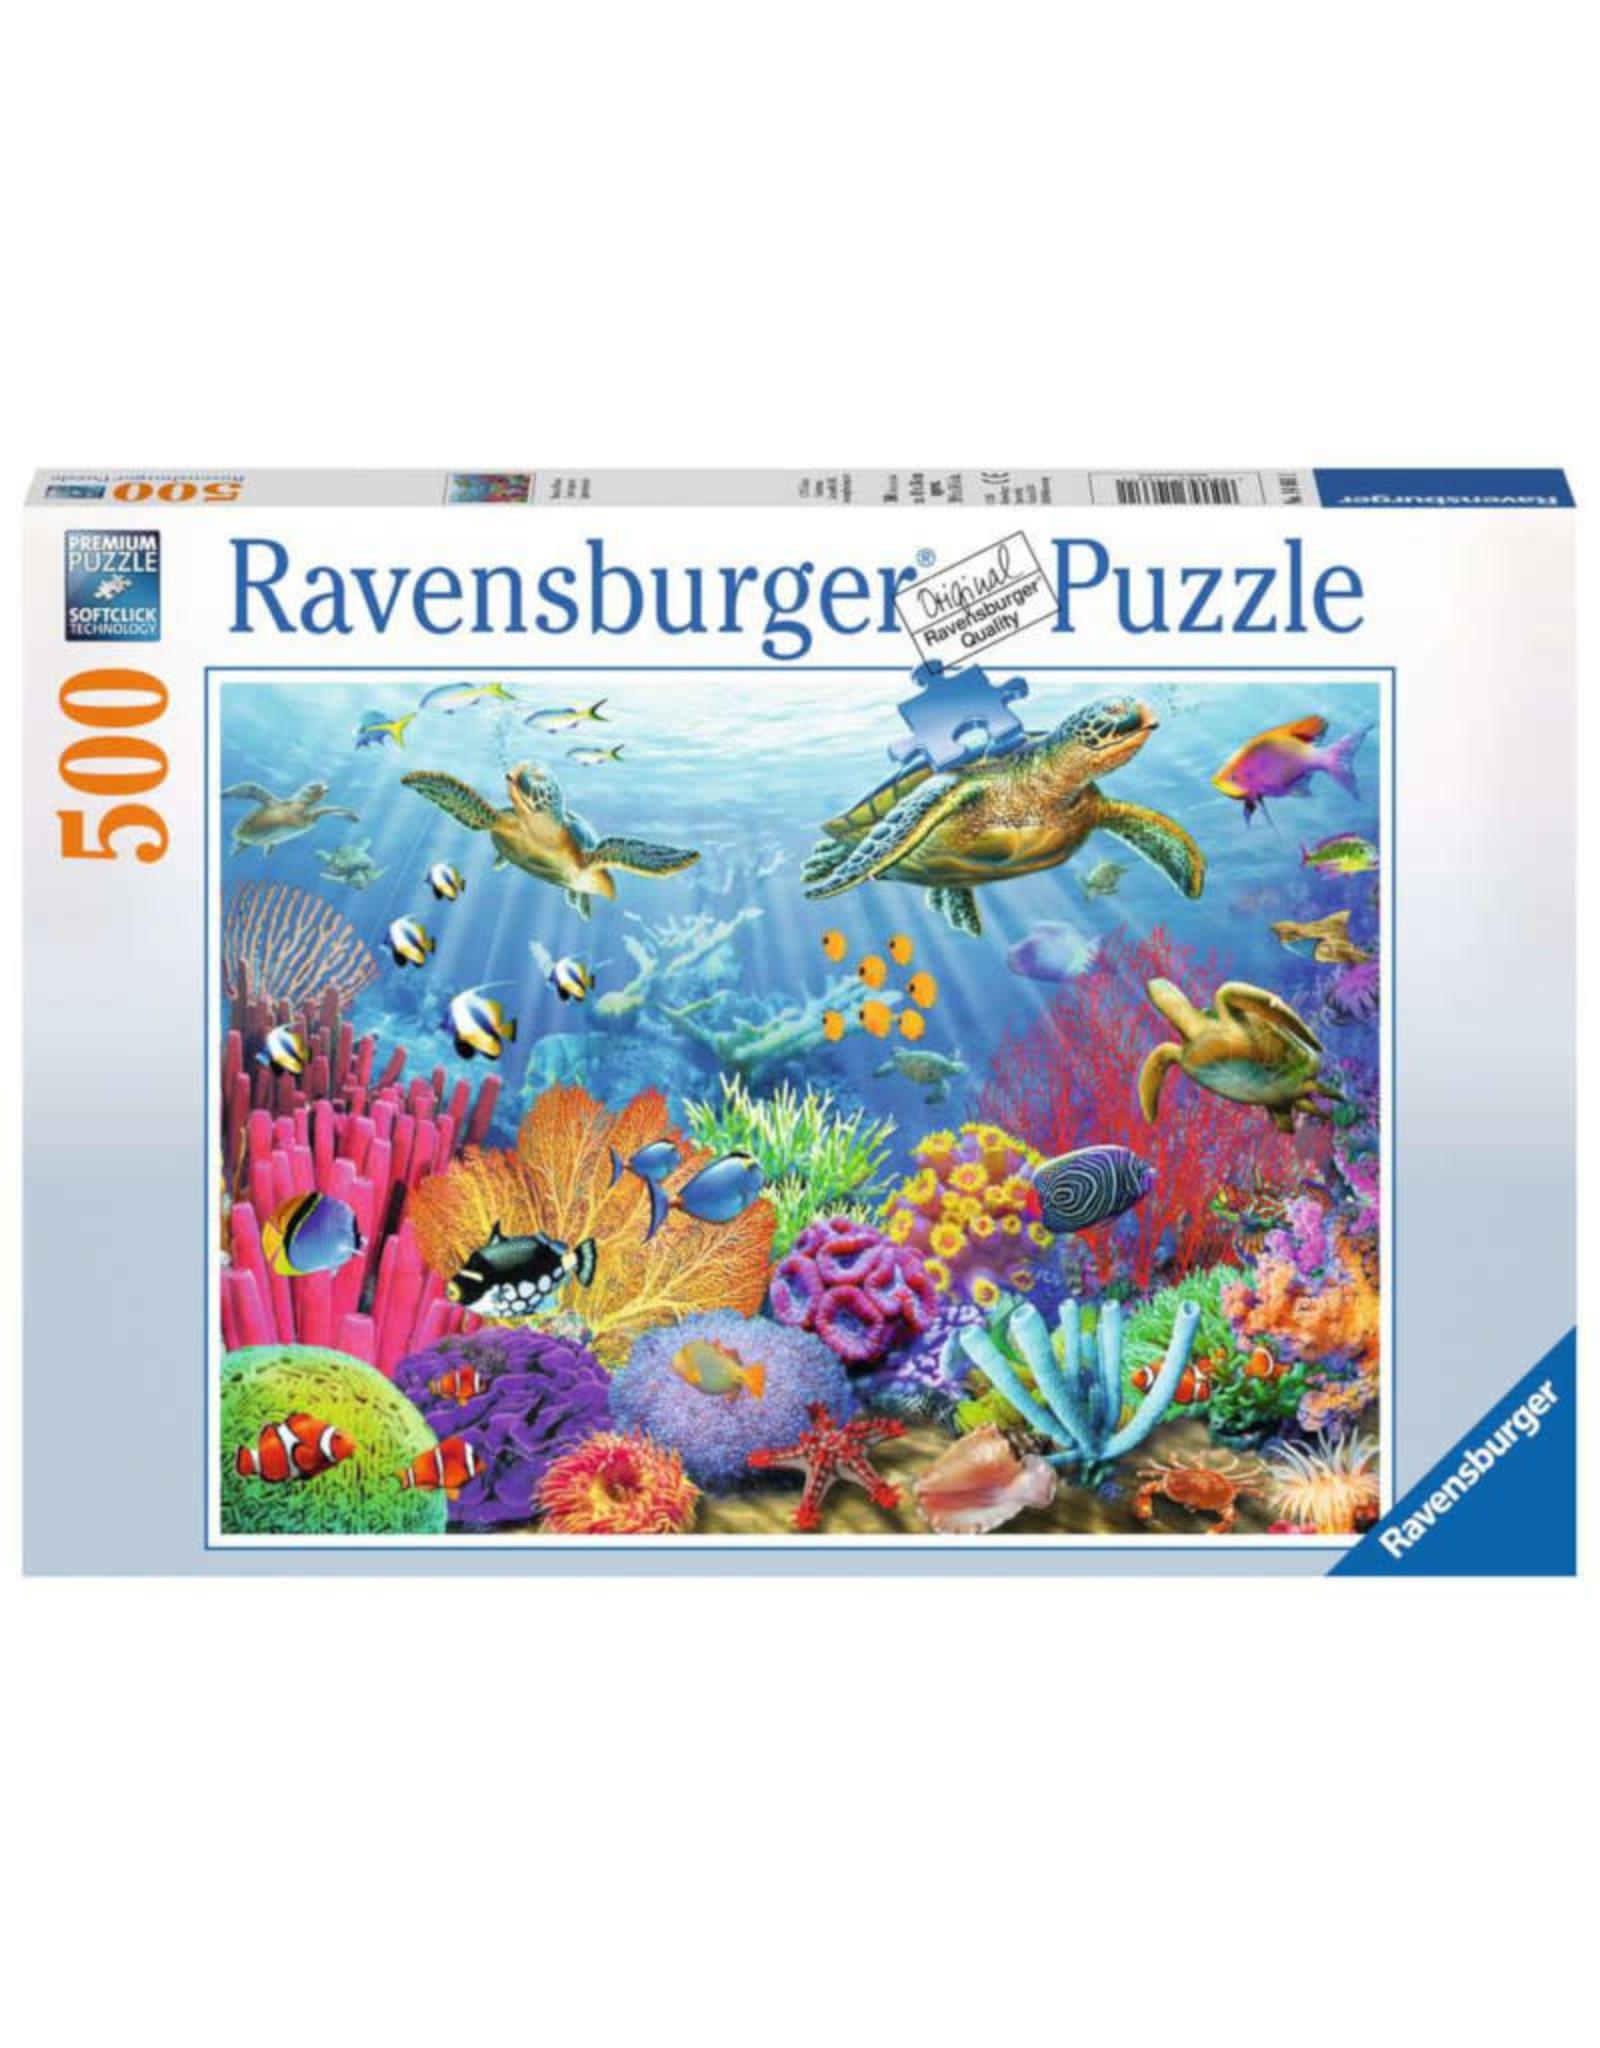 Ravensburger Tropical Waters Puzzle 500 PCS